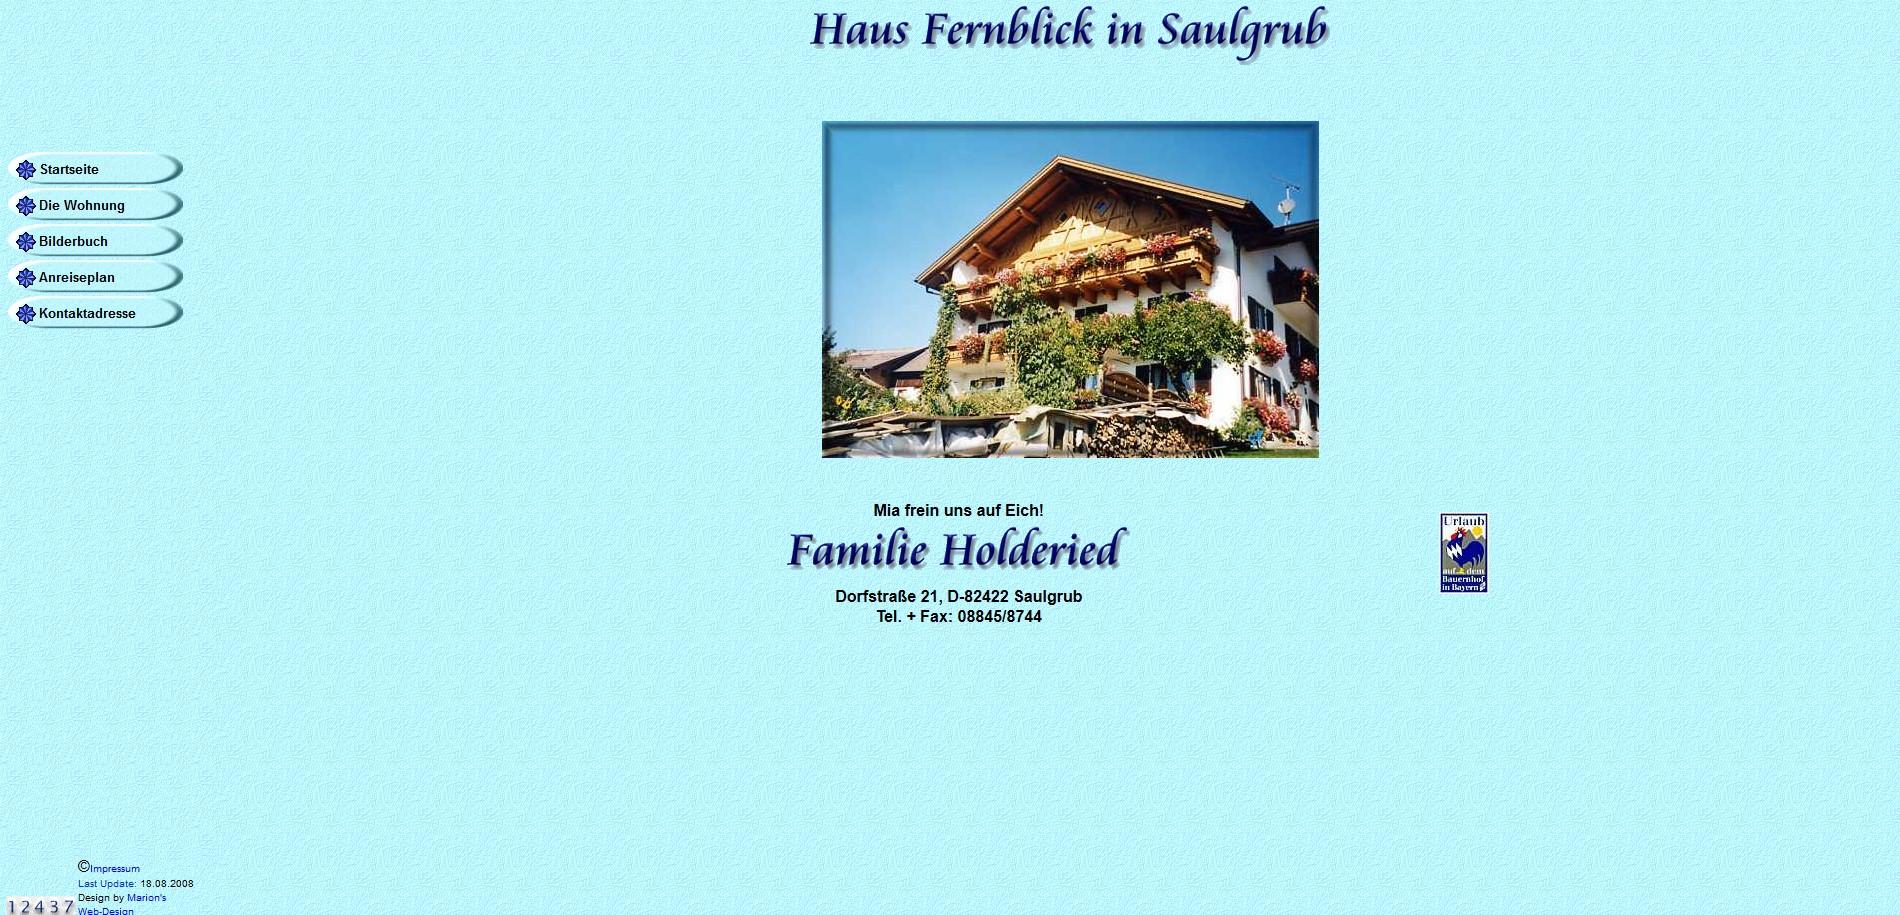 Haus Fernblick, Saulgrub